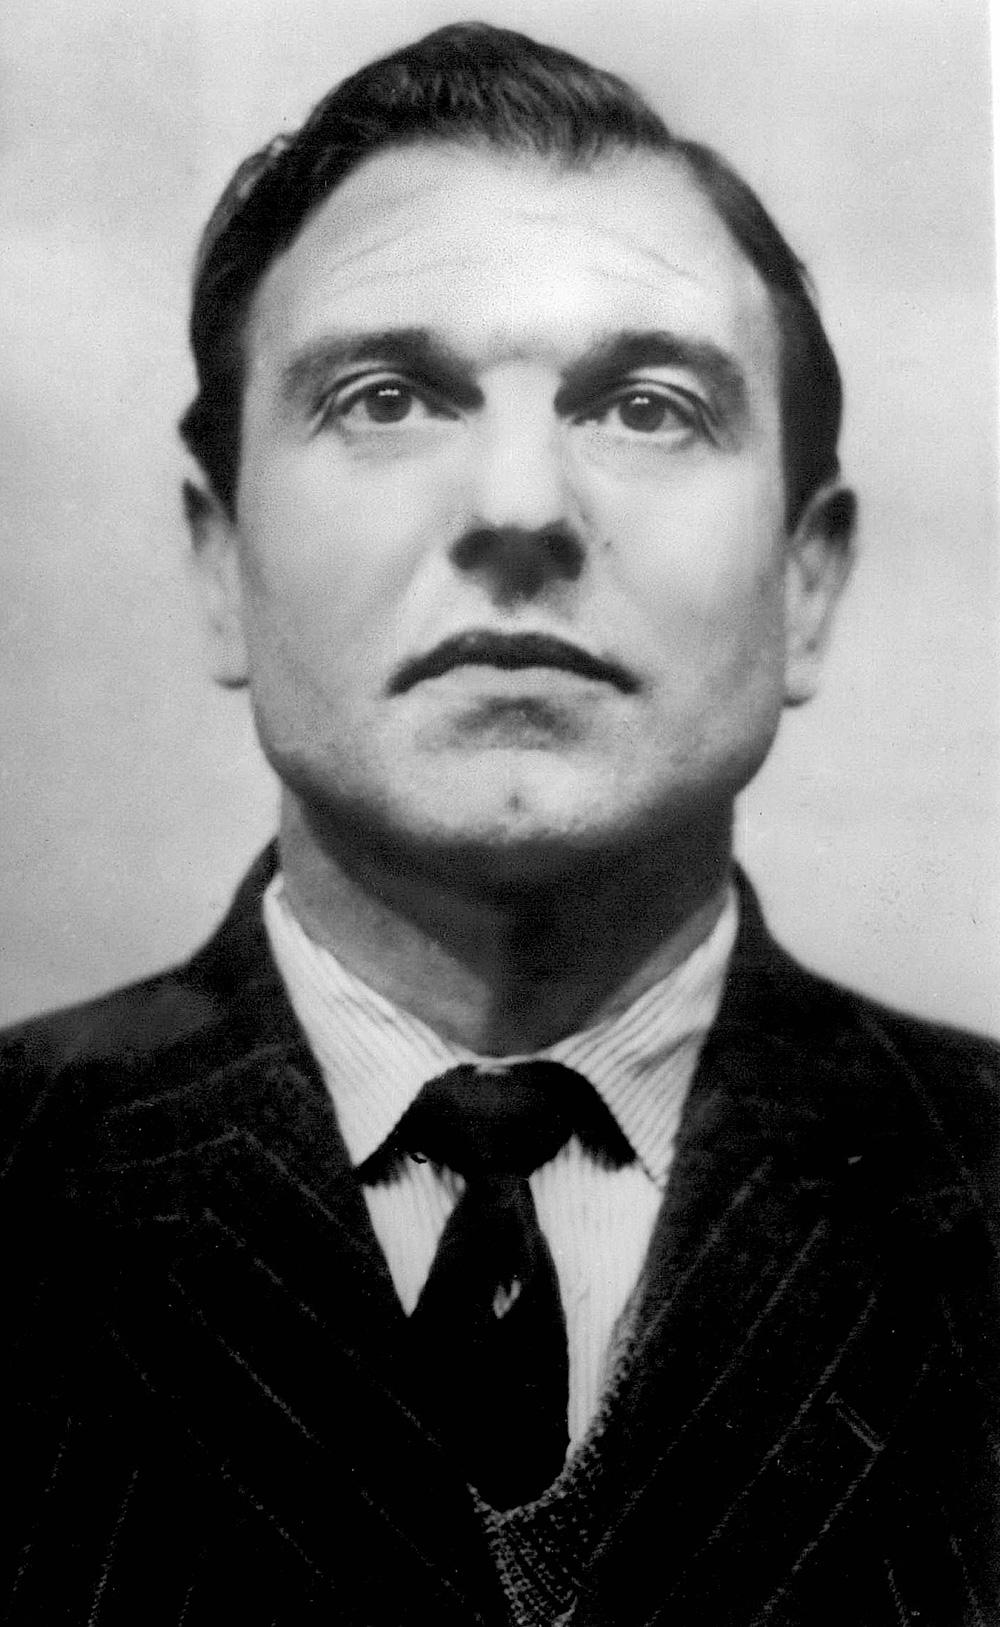 Джордж Блейк, 1966 г.